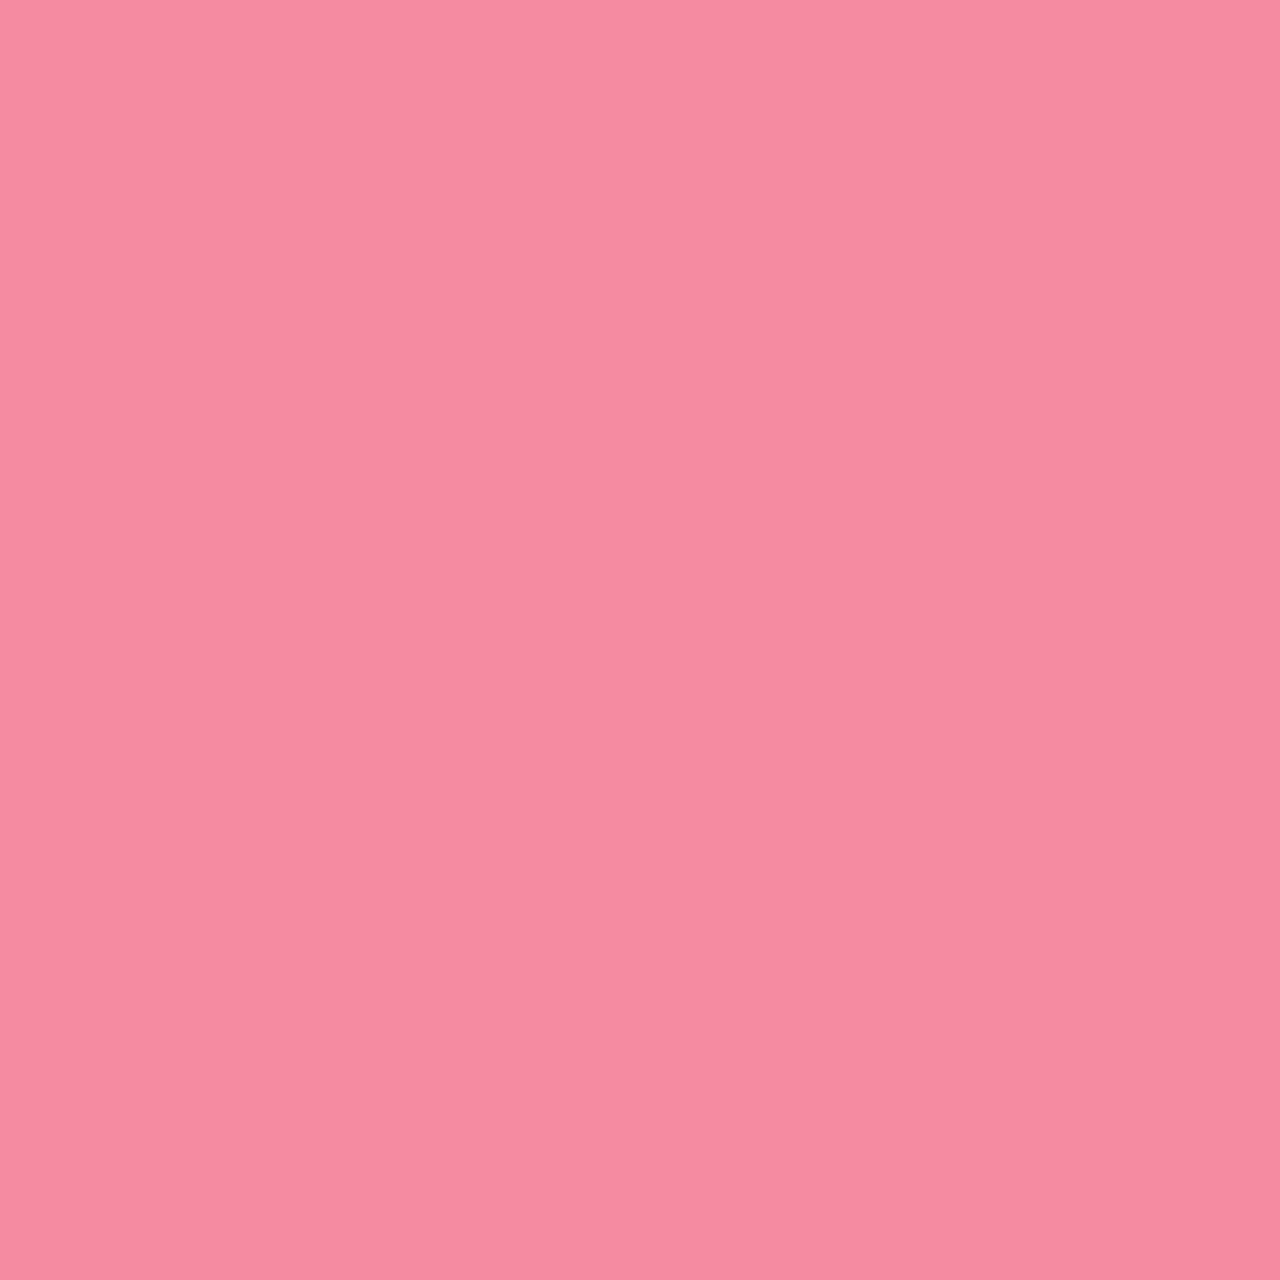 "#0034 Rosco Gels Roscolux Flesh Pink, 20x24"""